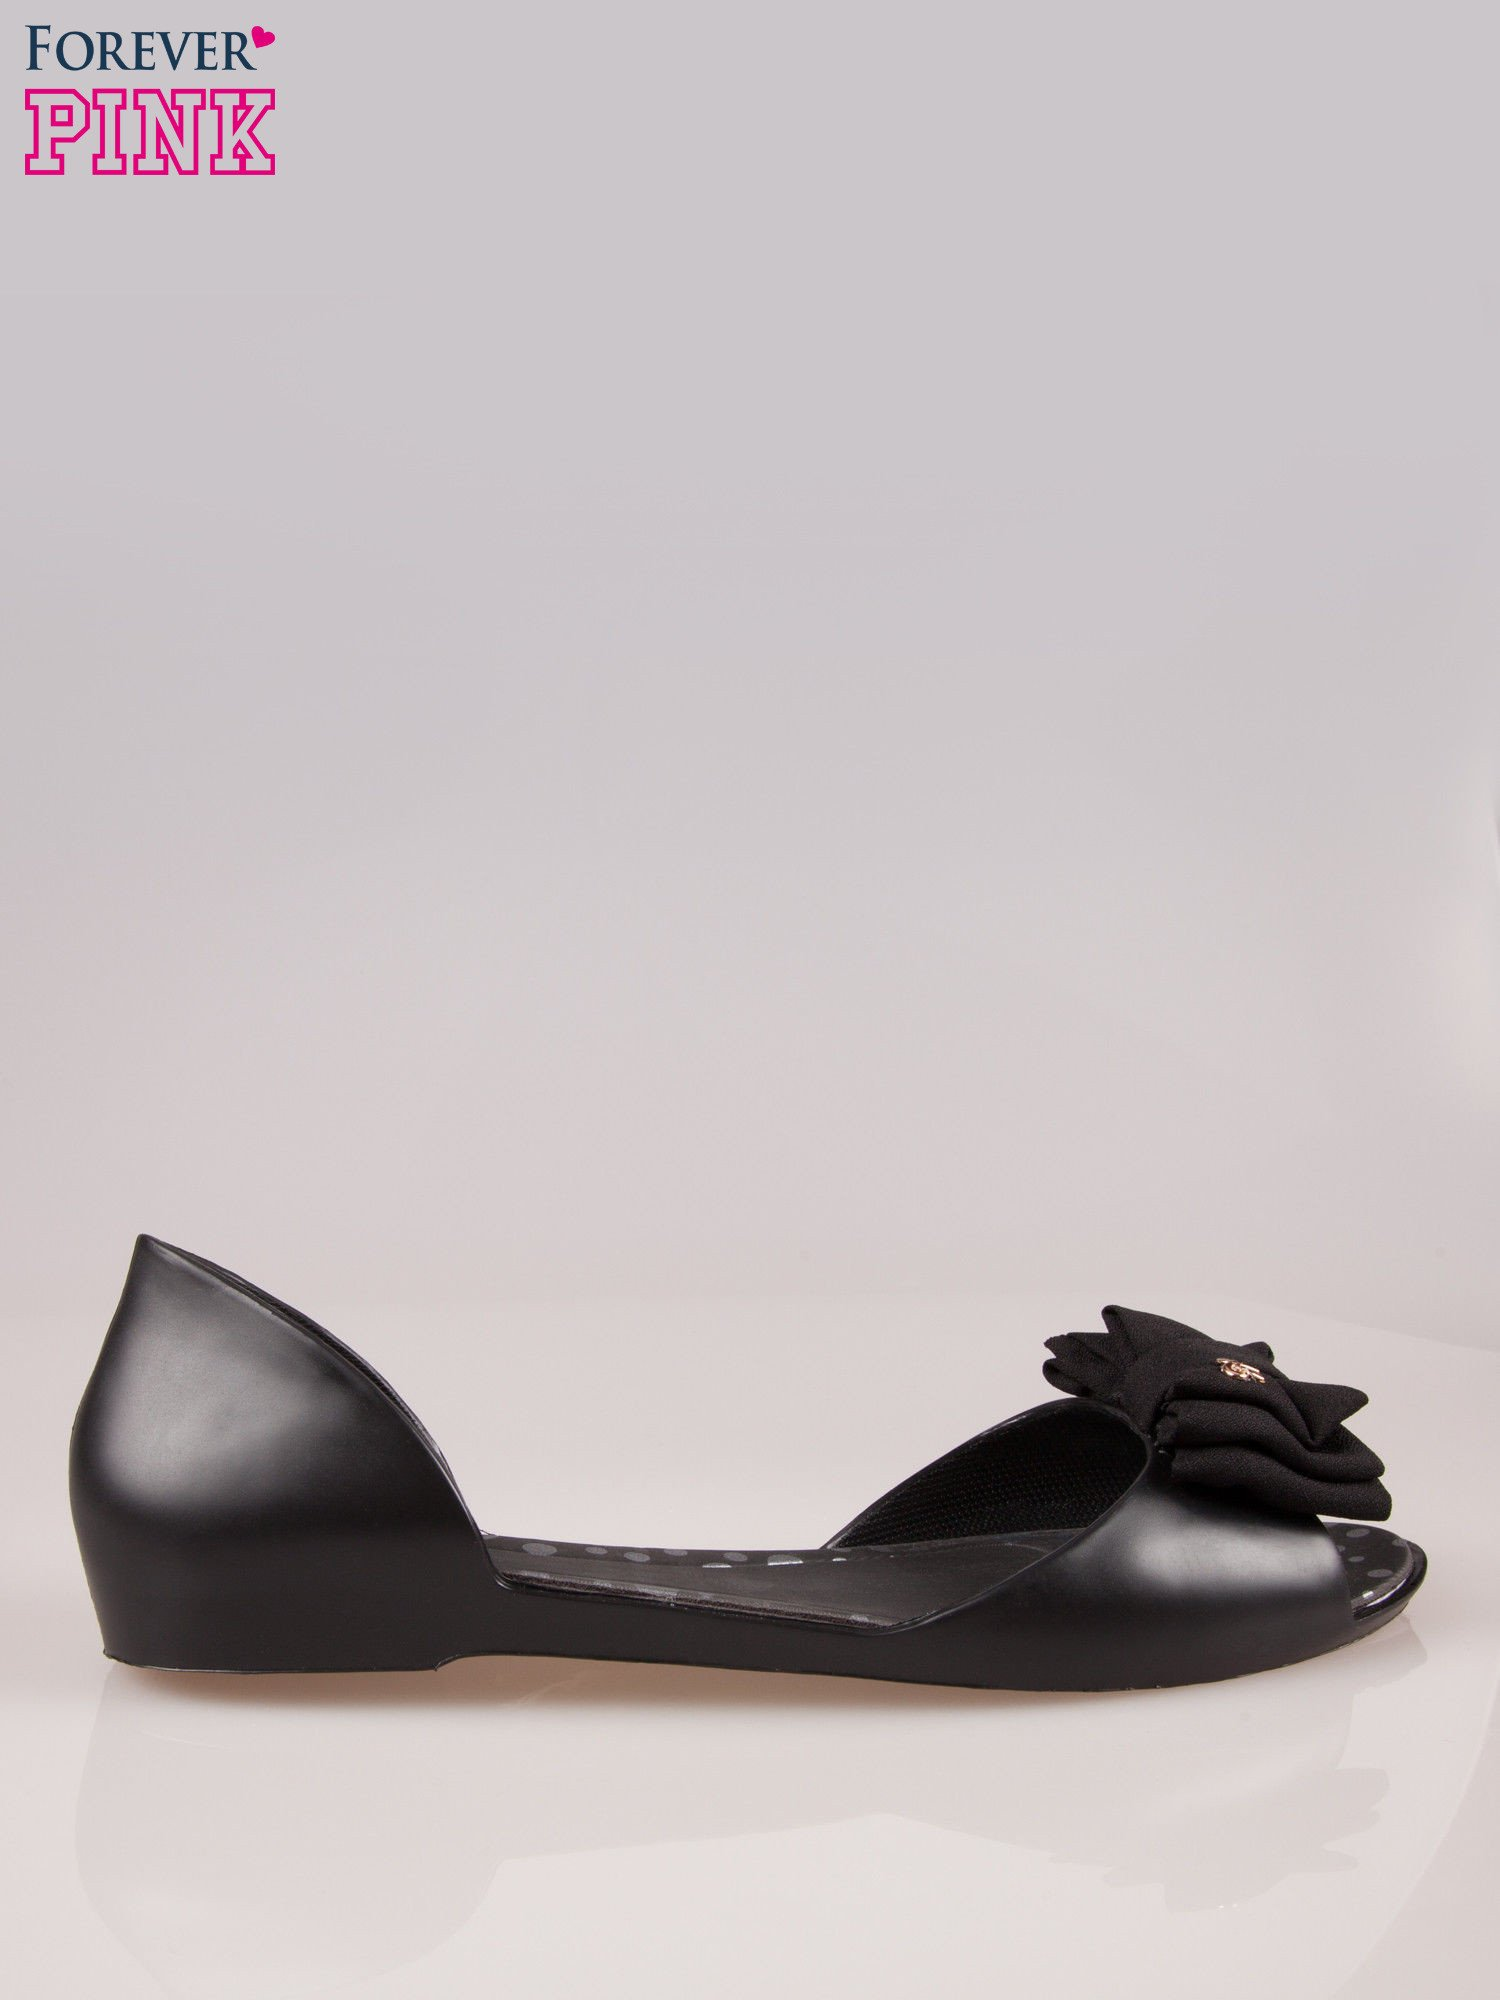 Czarne gumowe baleriny peep toe z materiałową kokardką                                  zdj.                                  1